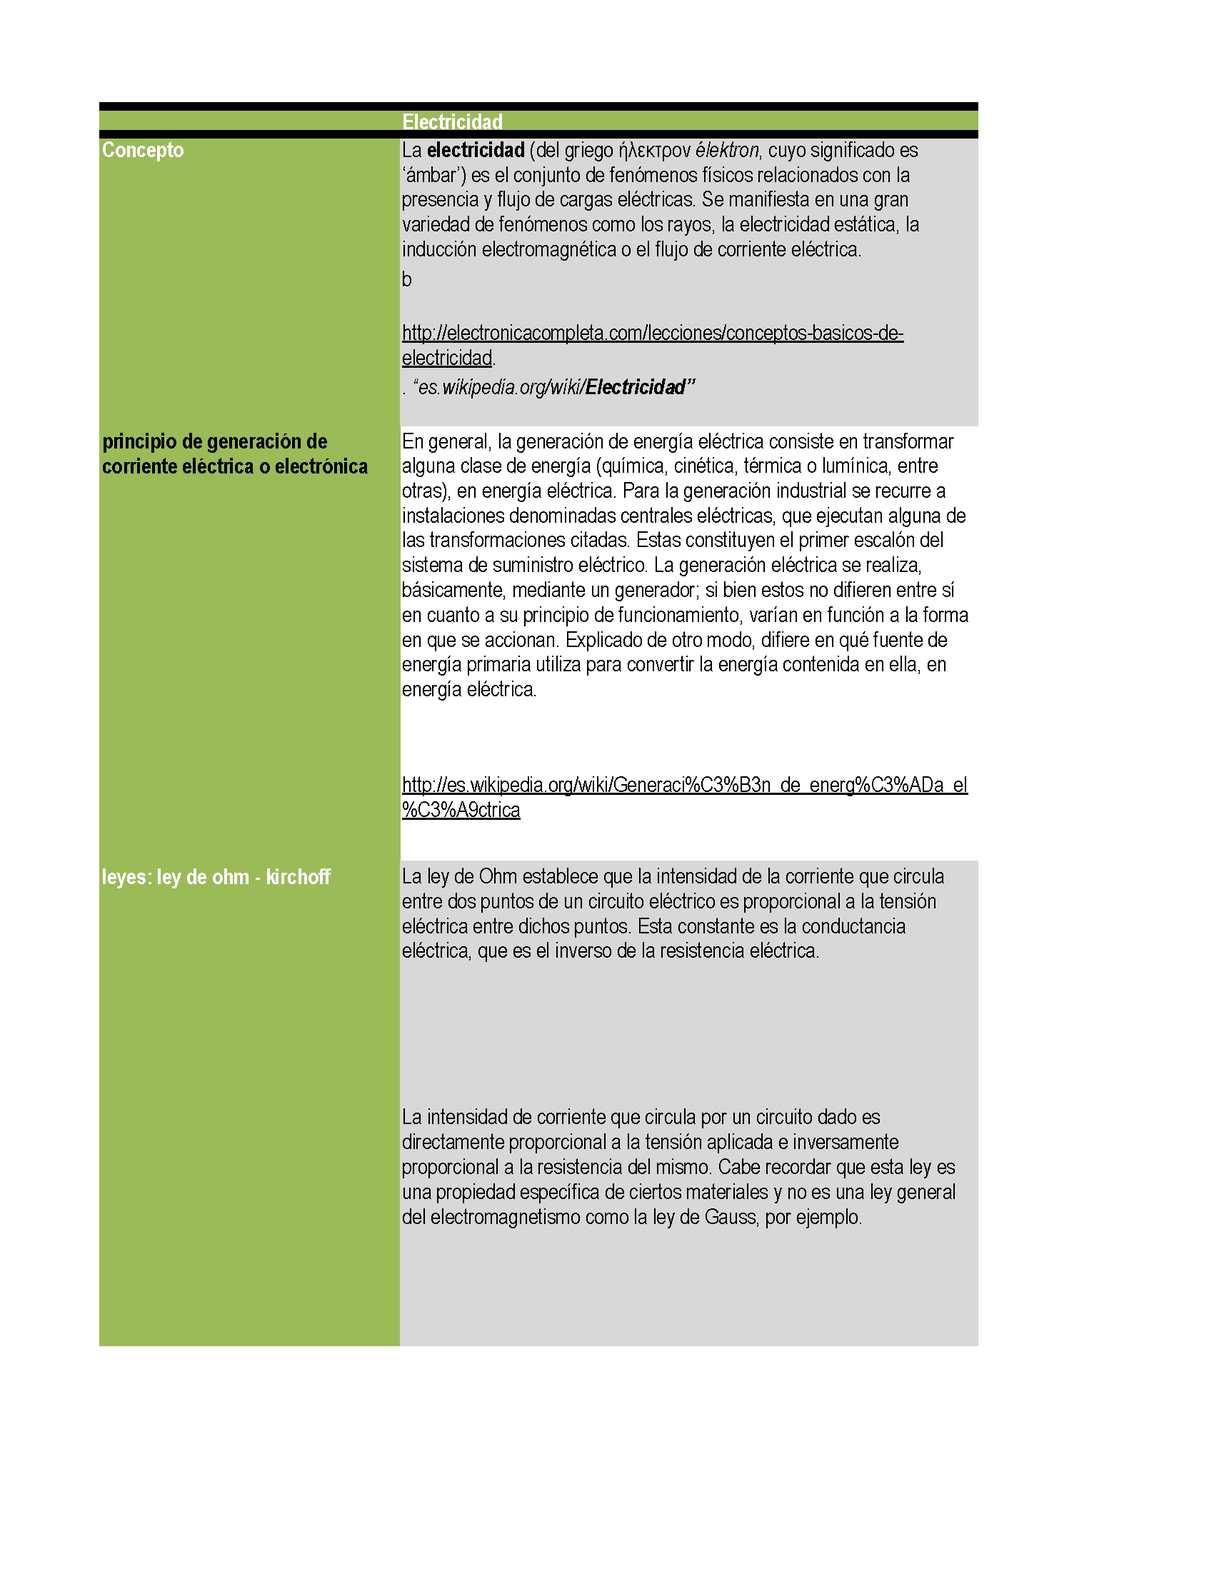 Circuito Hidraulico Mixto : Calaméo cuadro comparativo